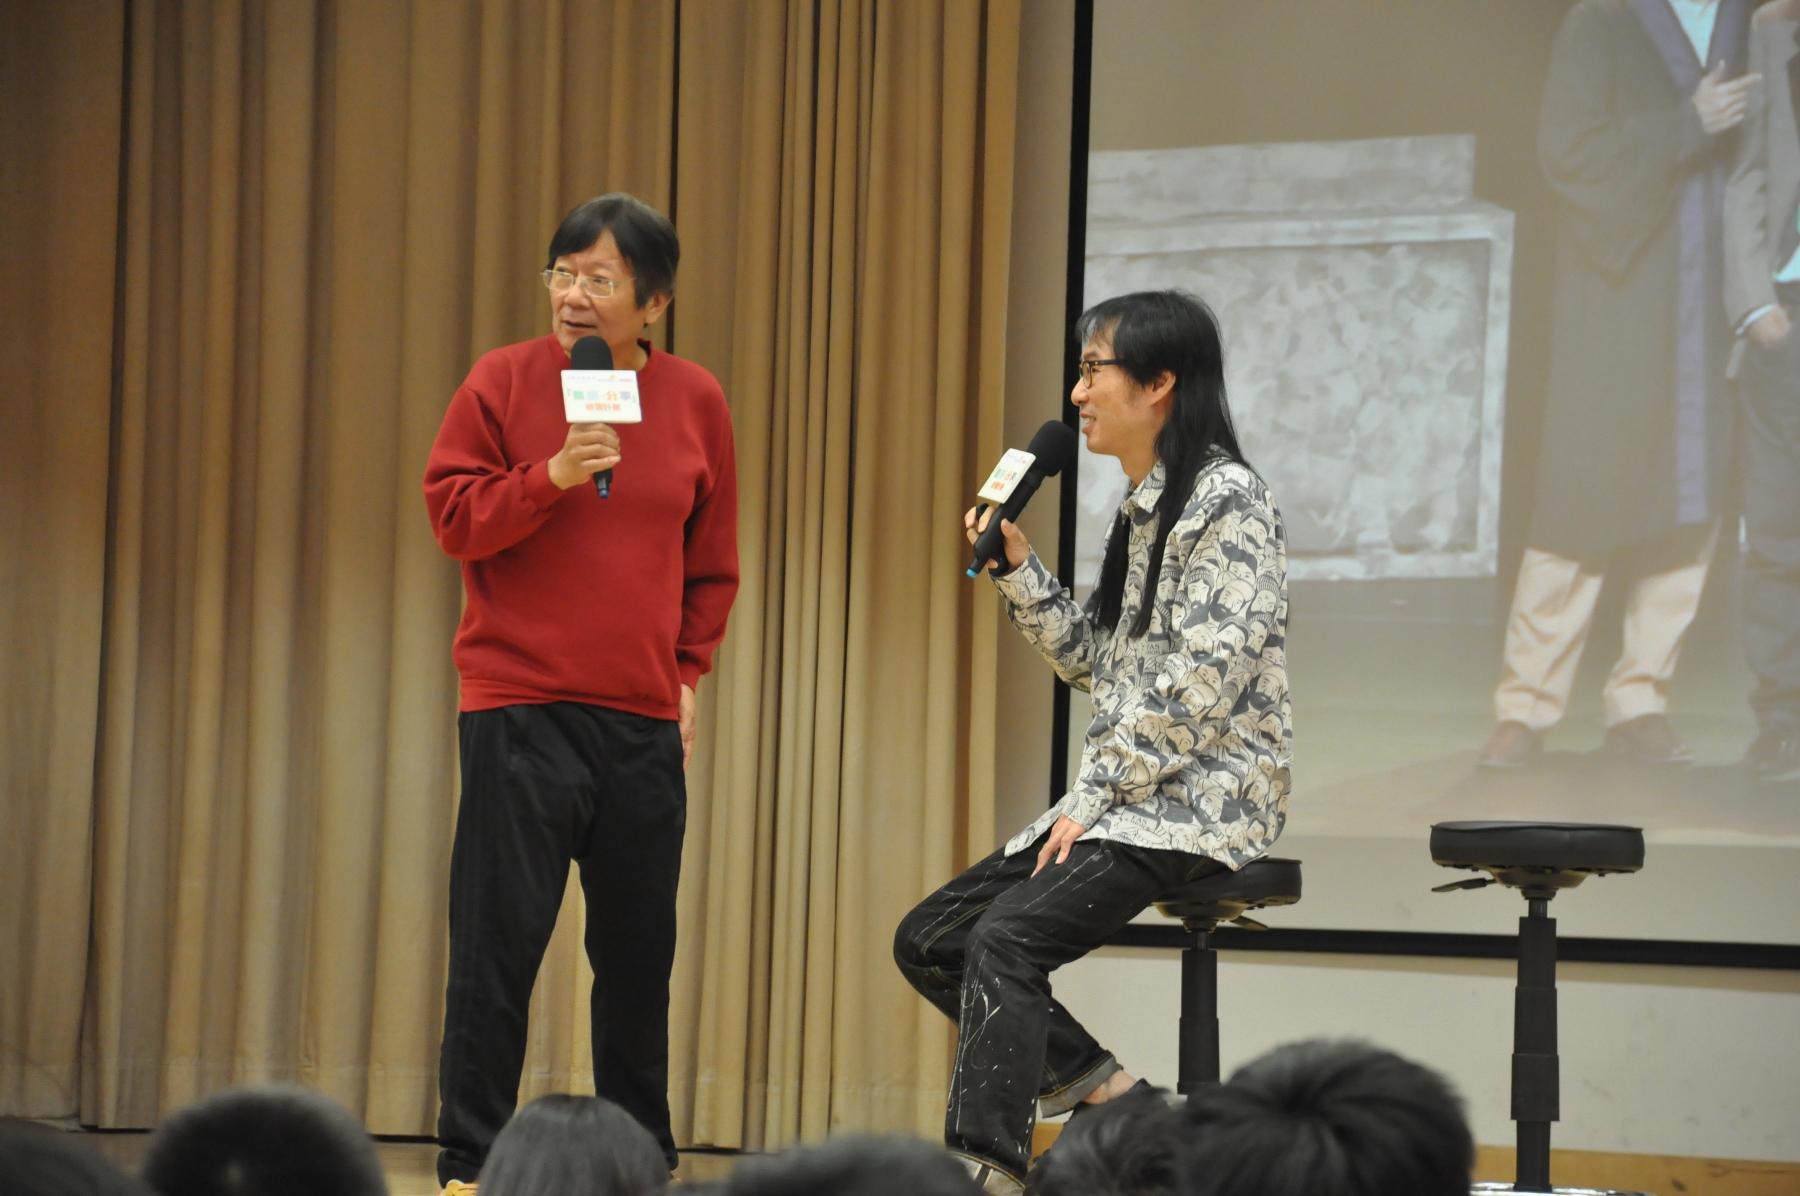 http://www.npc.edu.hk/sites/default/files/dsc_0011.jpg